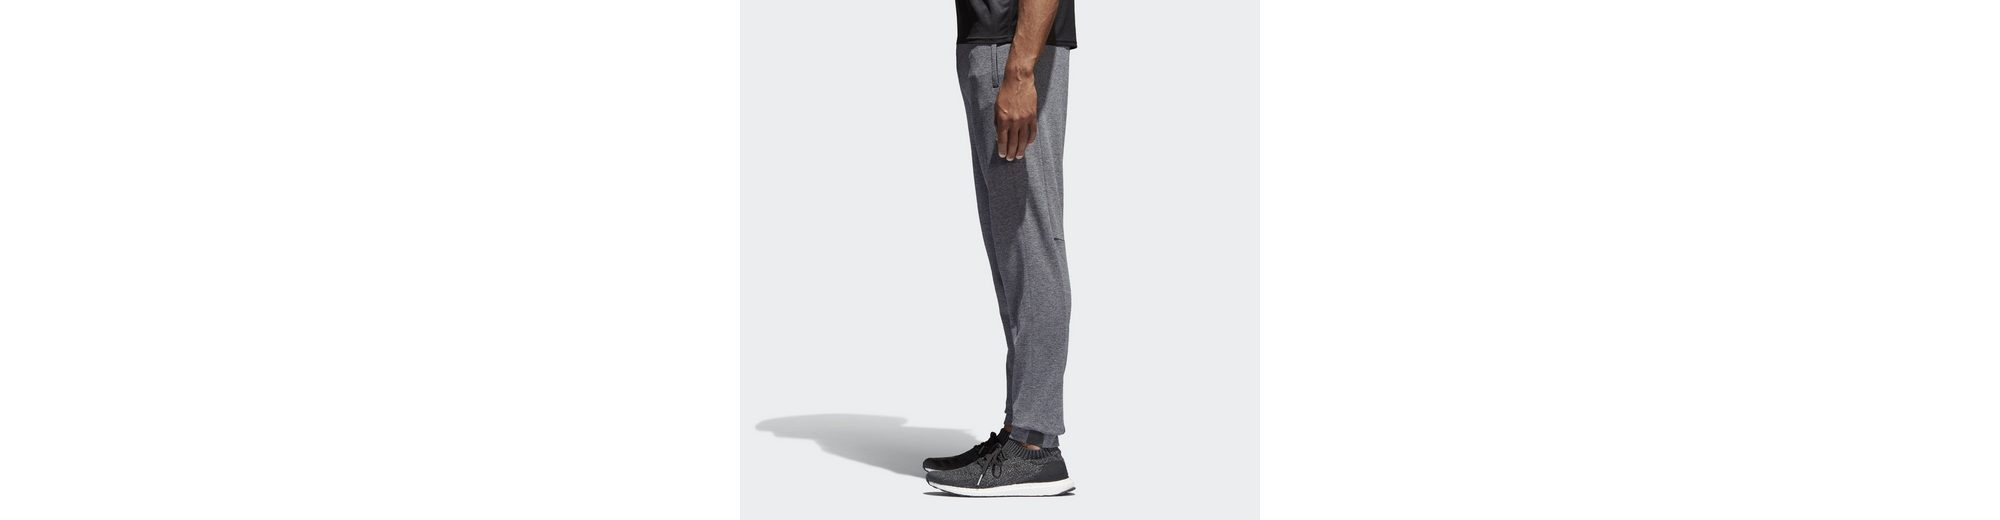 adidas Performance Sporthose Ultra Energy Billig Verkauf Sneakernews w0HU5gH2z